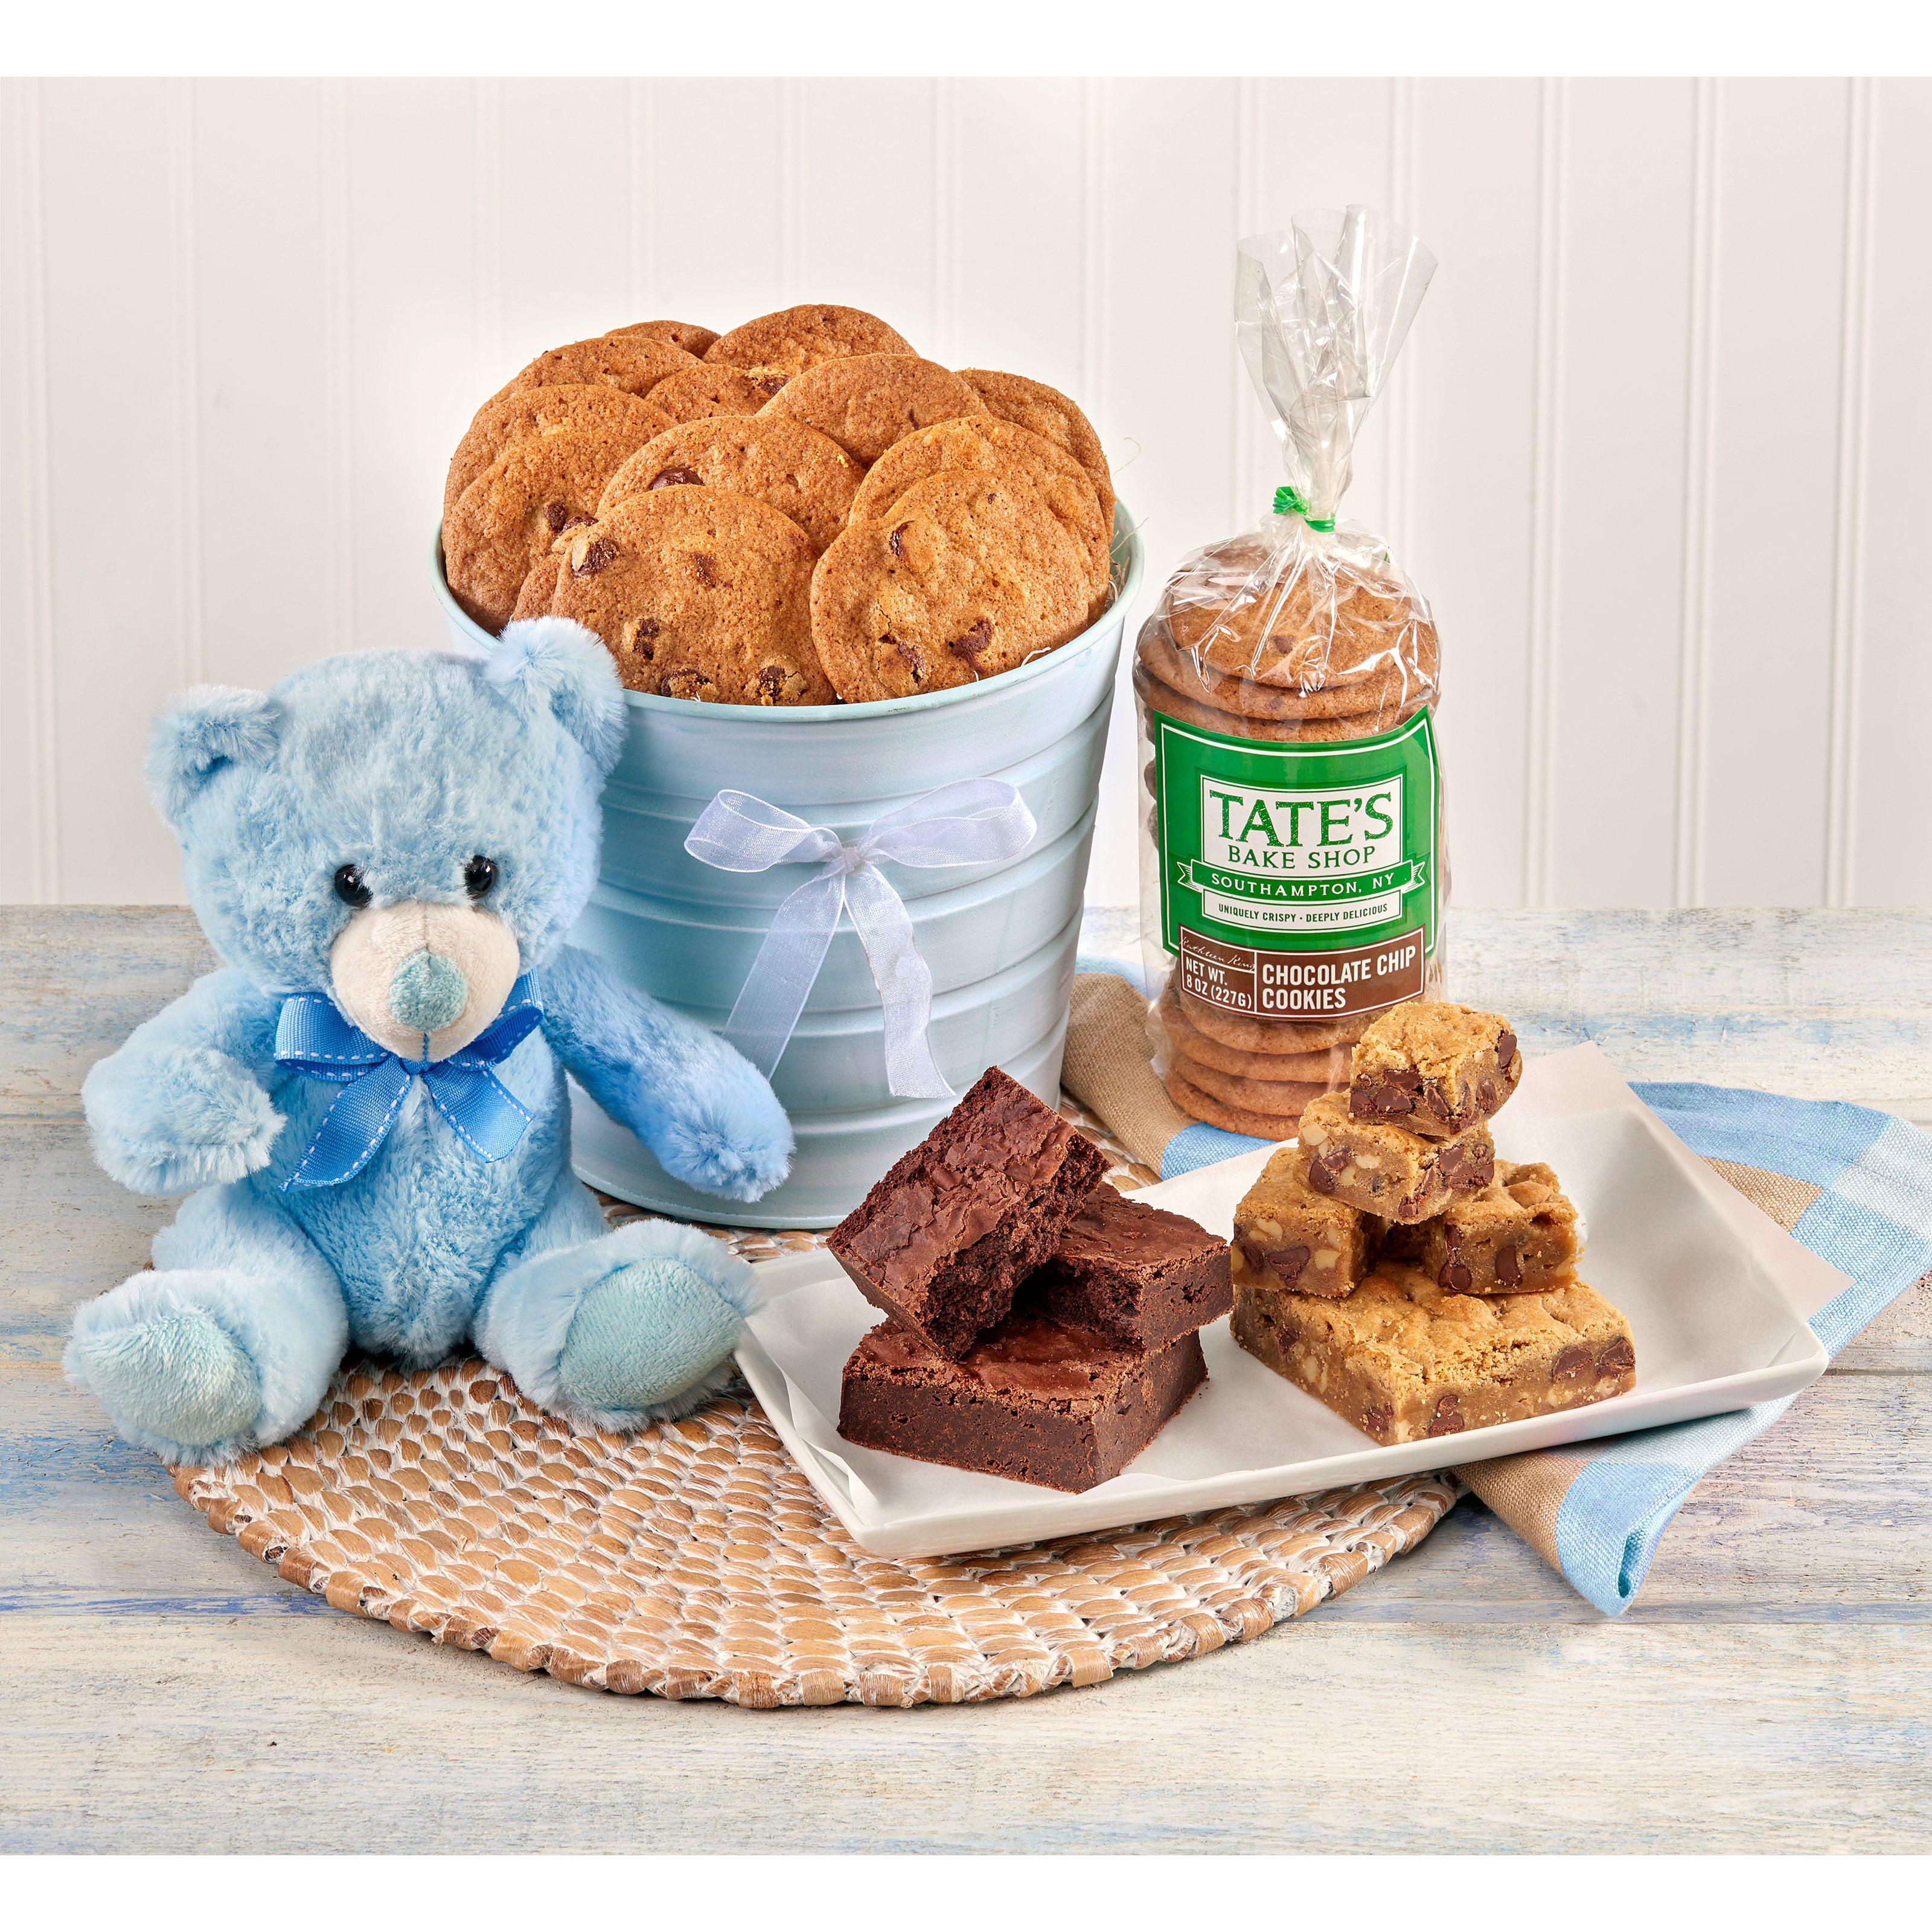 Tates Bake Shop Congratulations - Its A Boy! Gift Basket